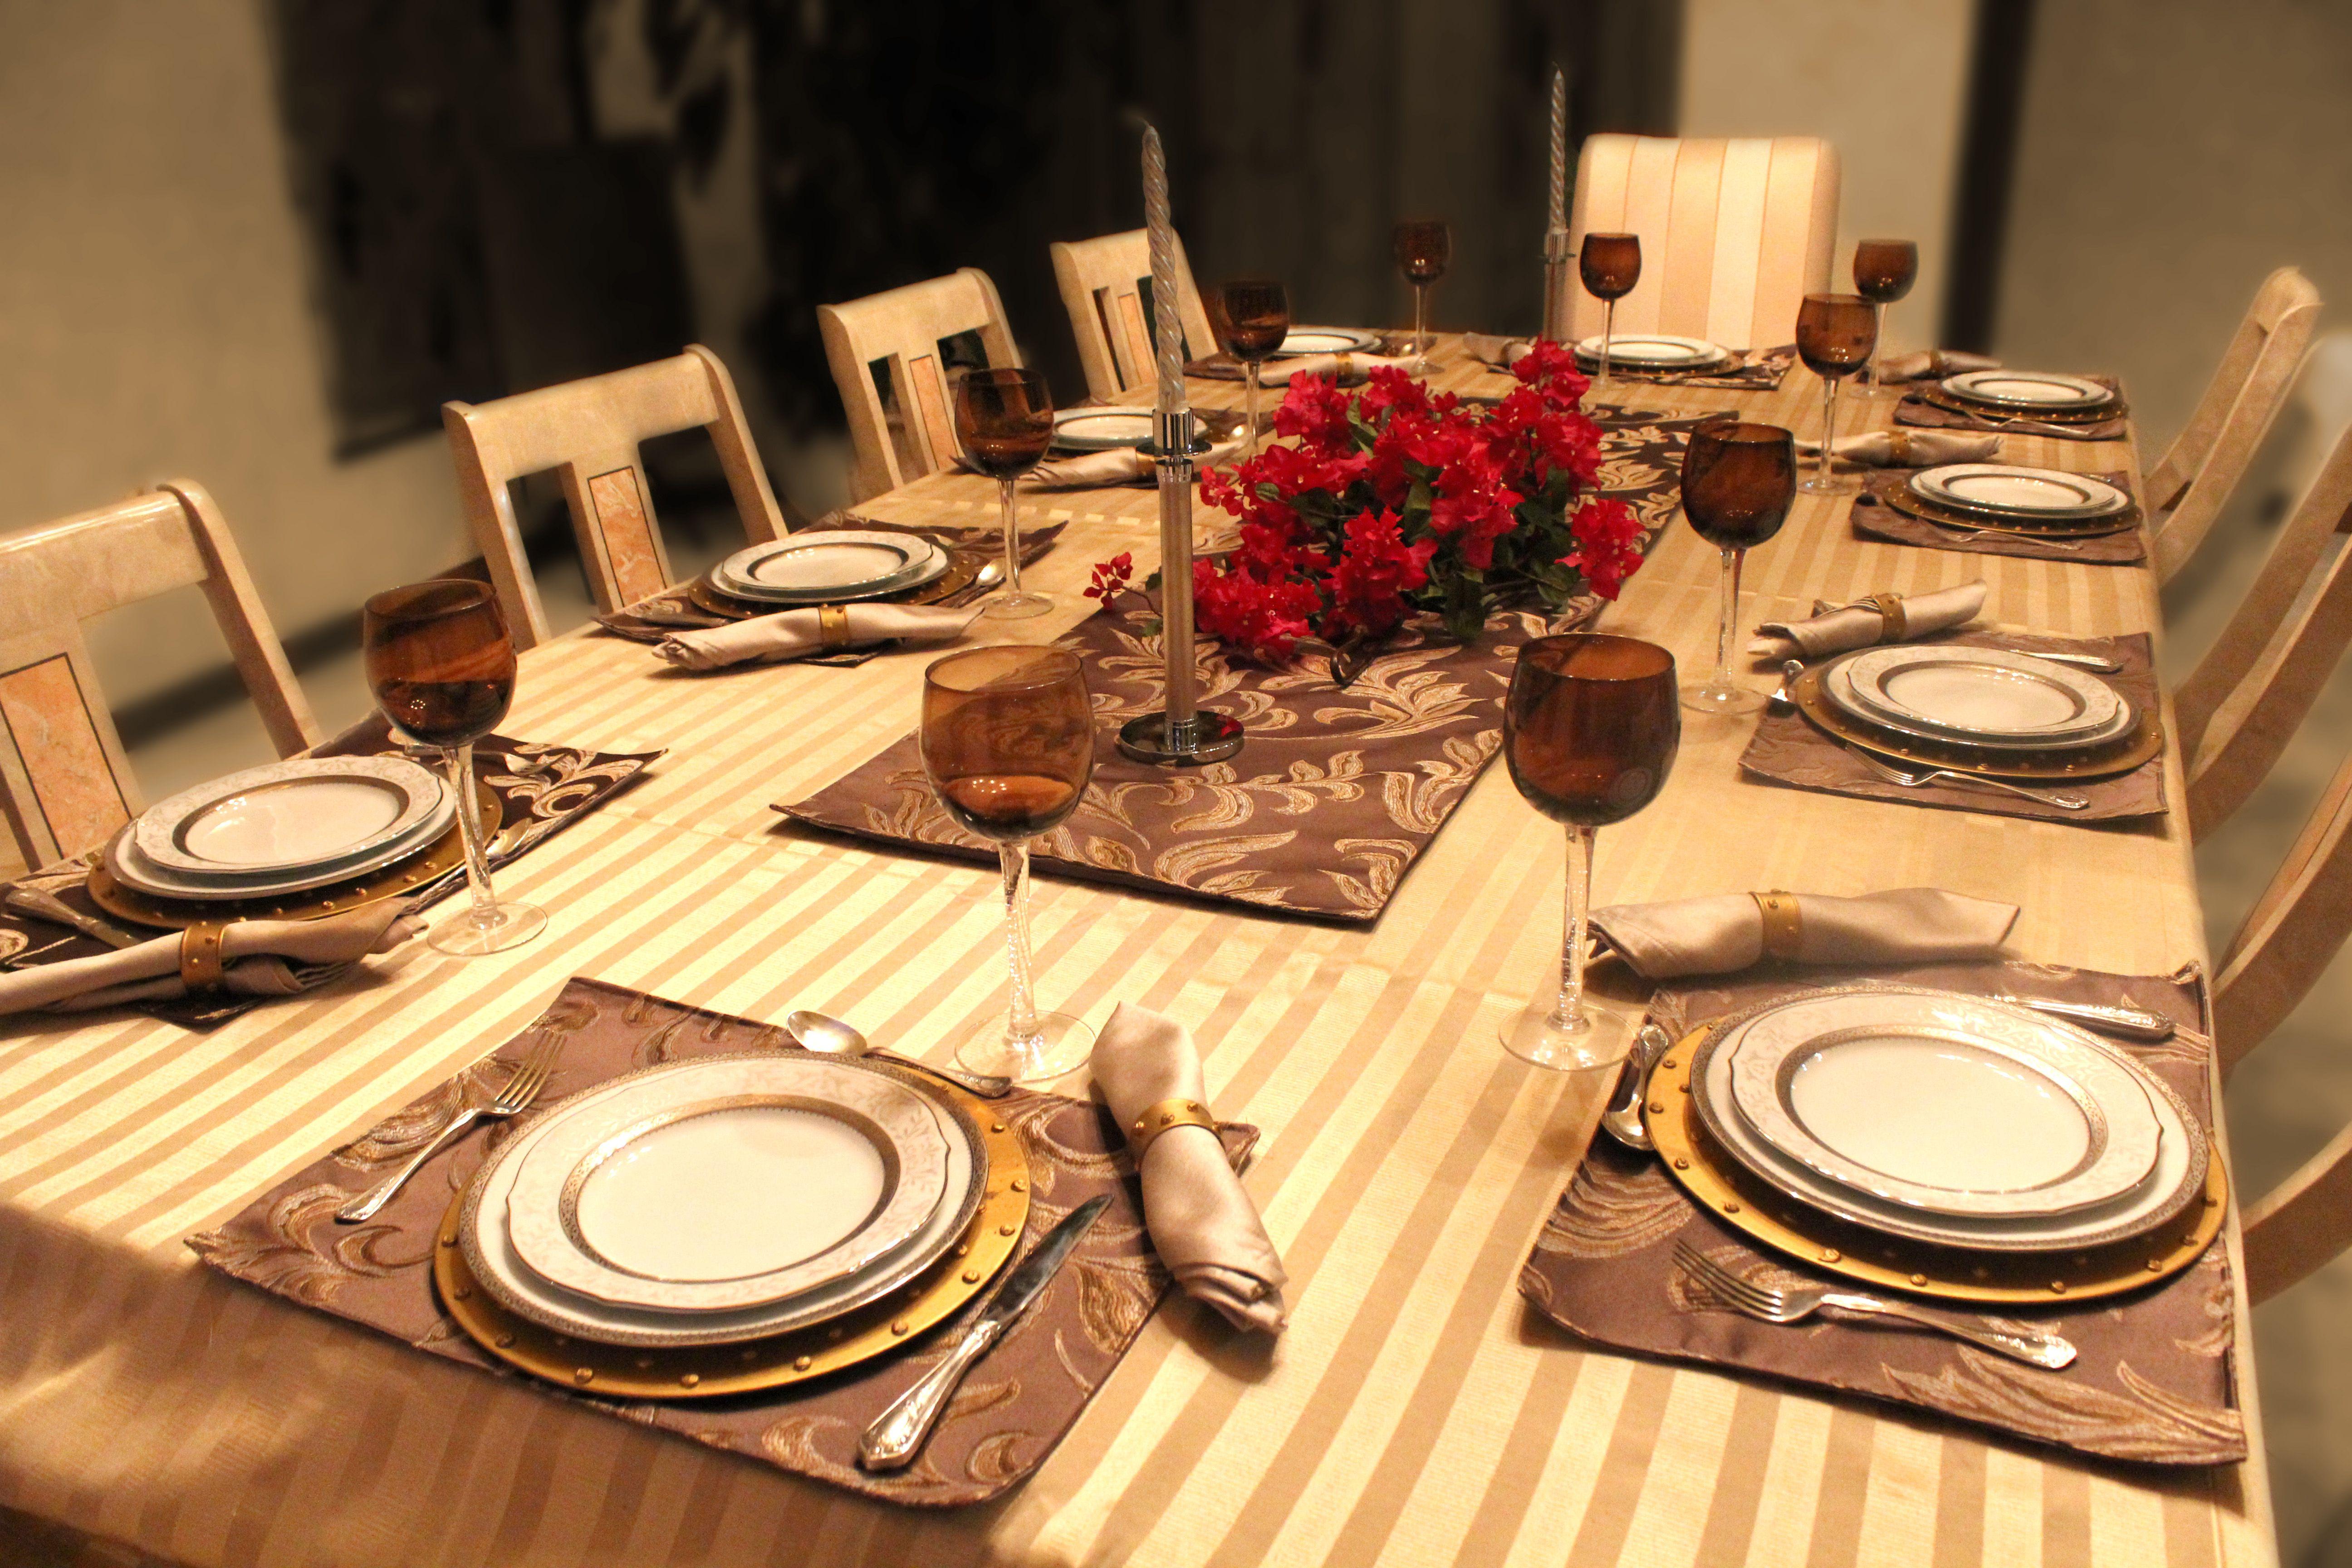 Mantel individuales y camino de mesa what we love to do pinterest patchwork ideas - Individuales para mesa ...